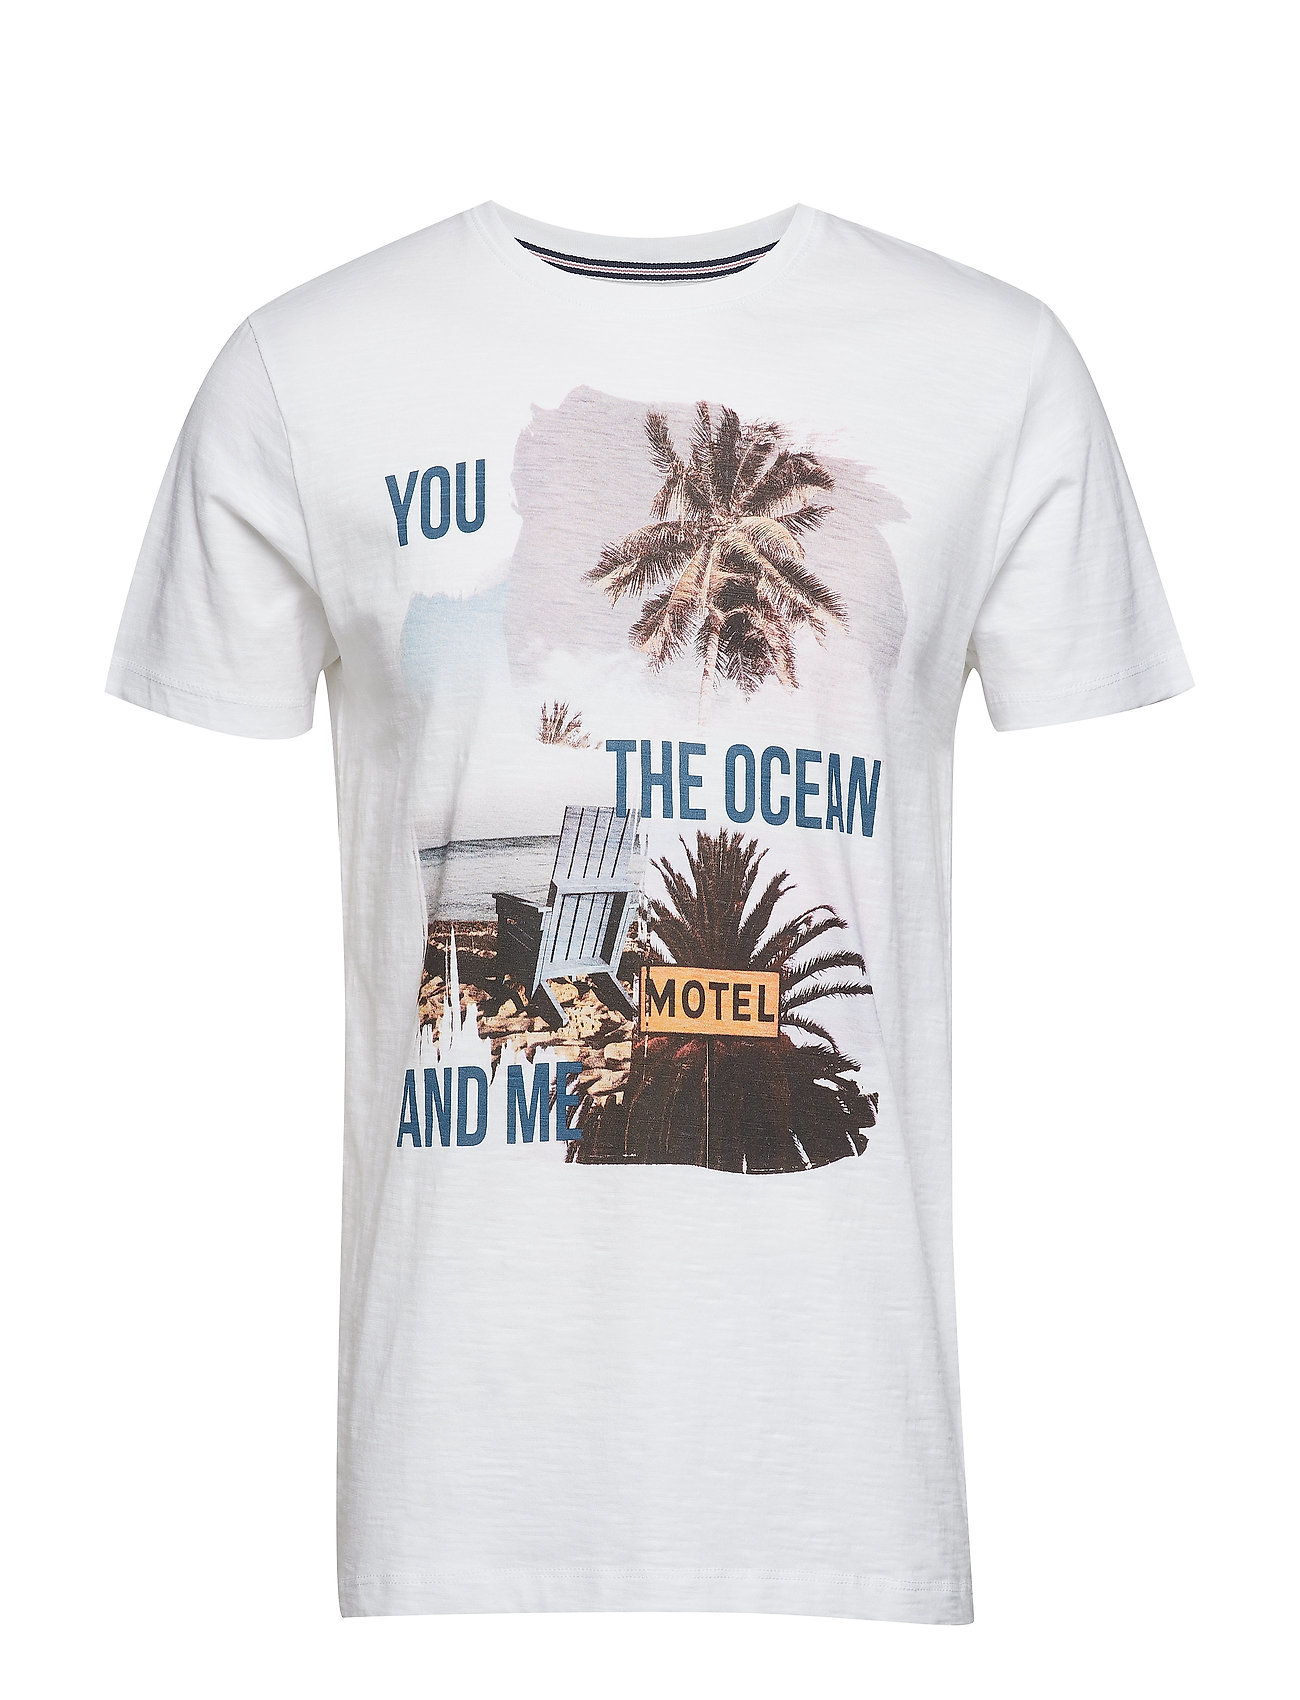 Image of T-Shirts T-shirt Hvid ESPRIT CASUAL (3172668089)